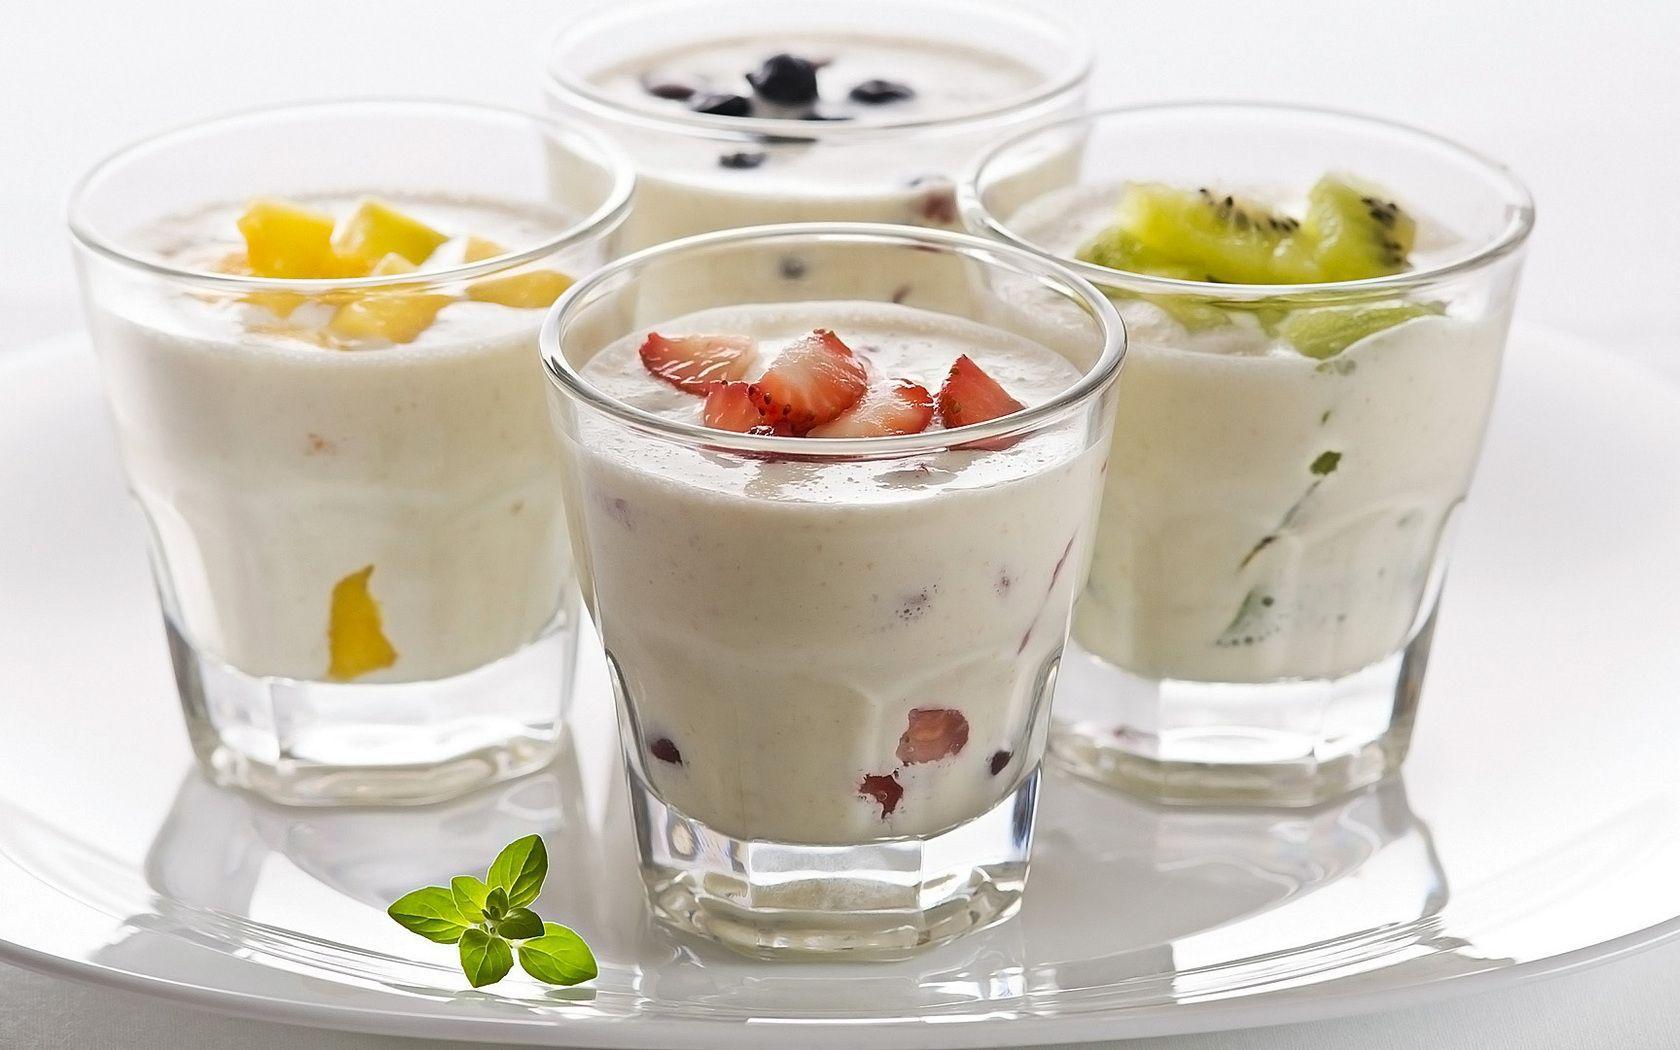 Йогурт спасет от диабета второго типа